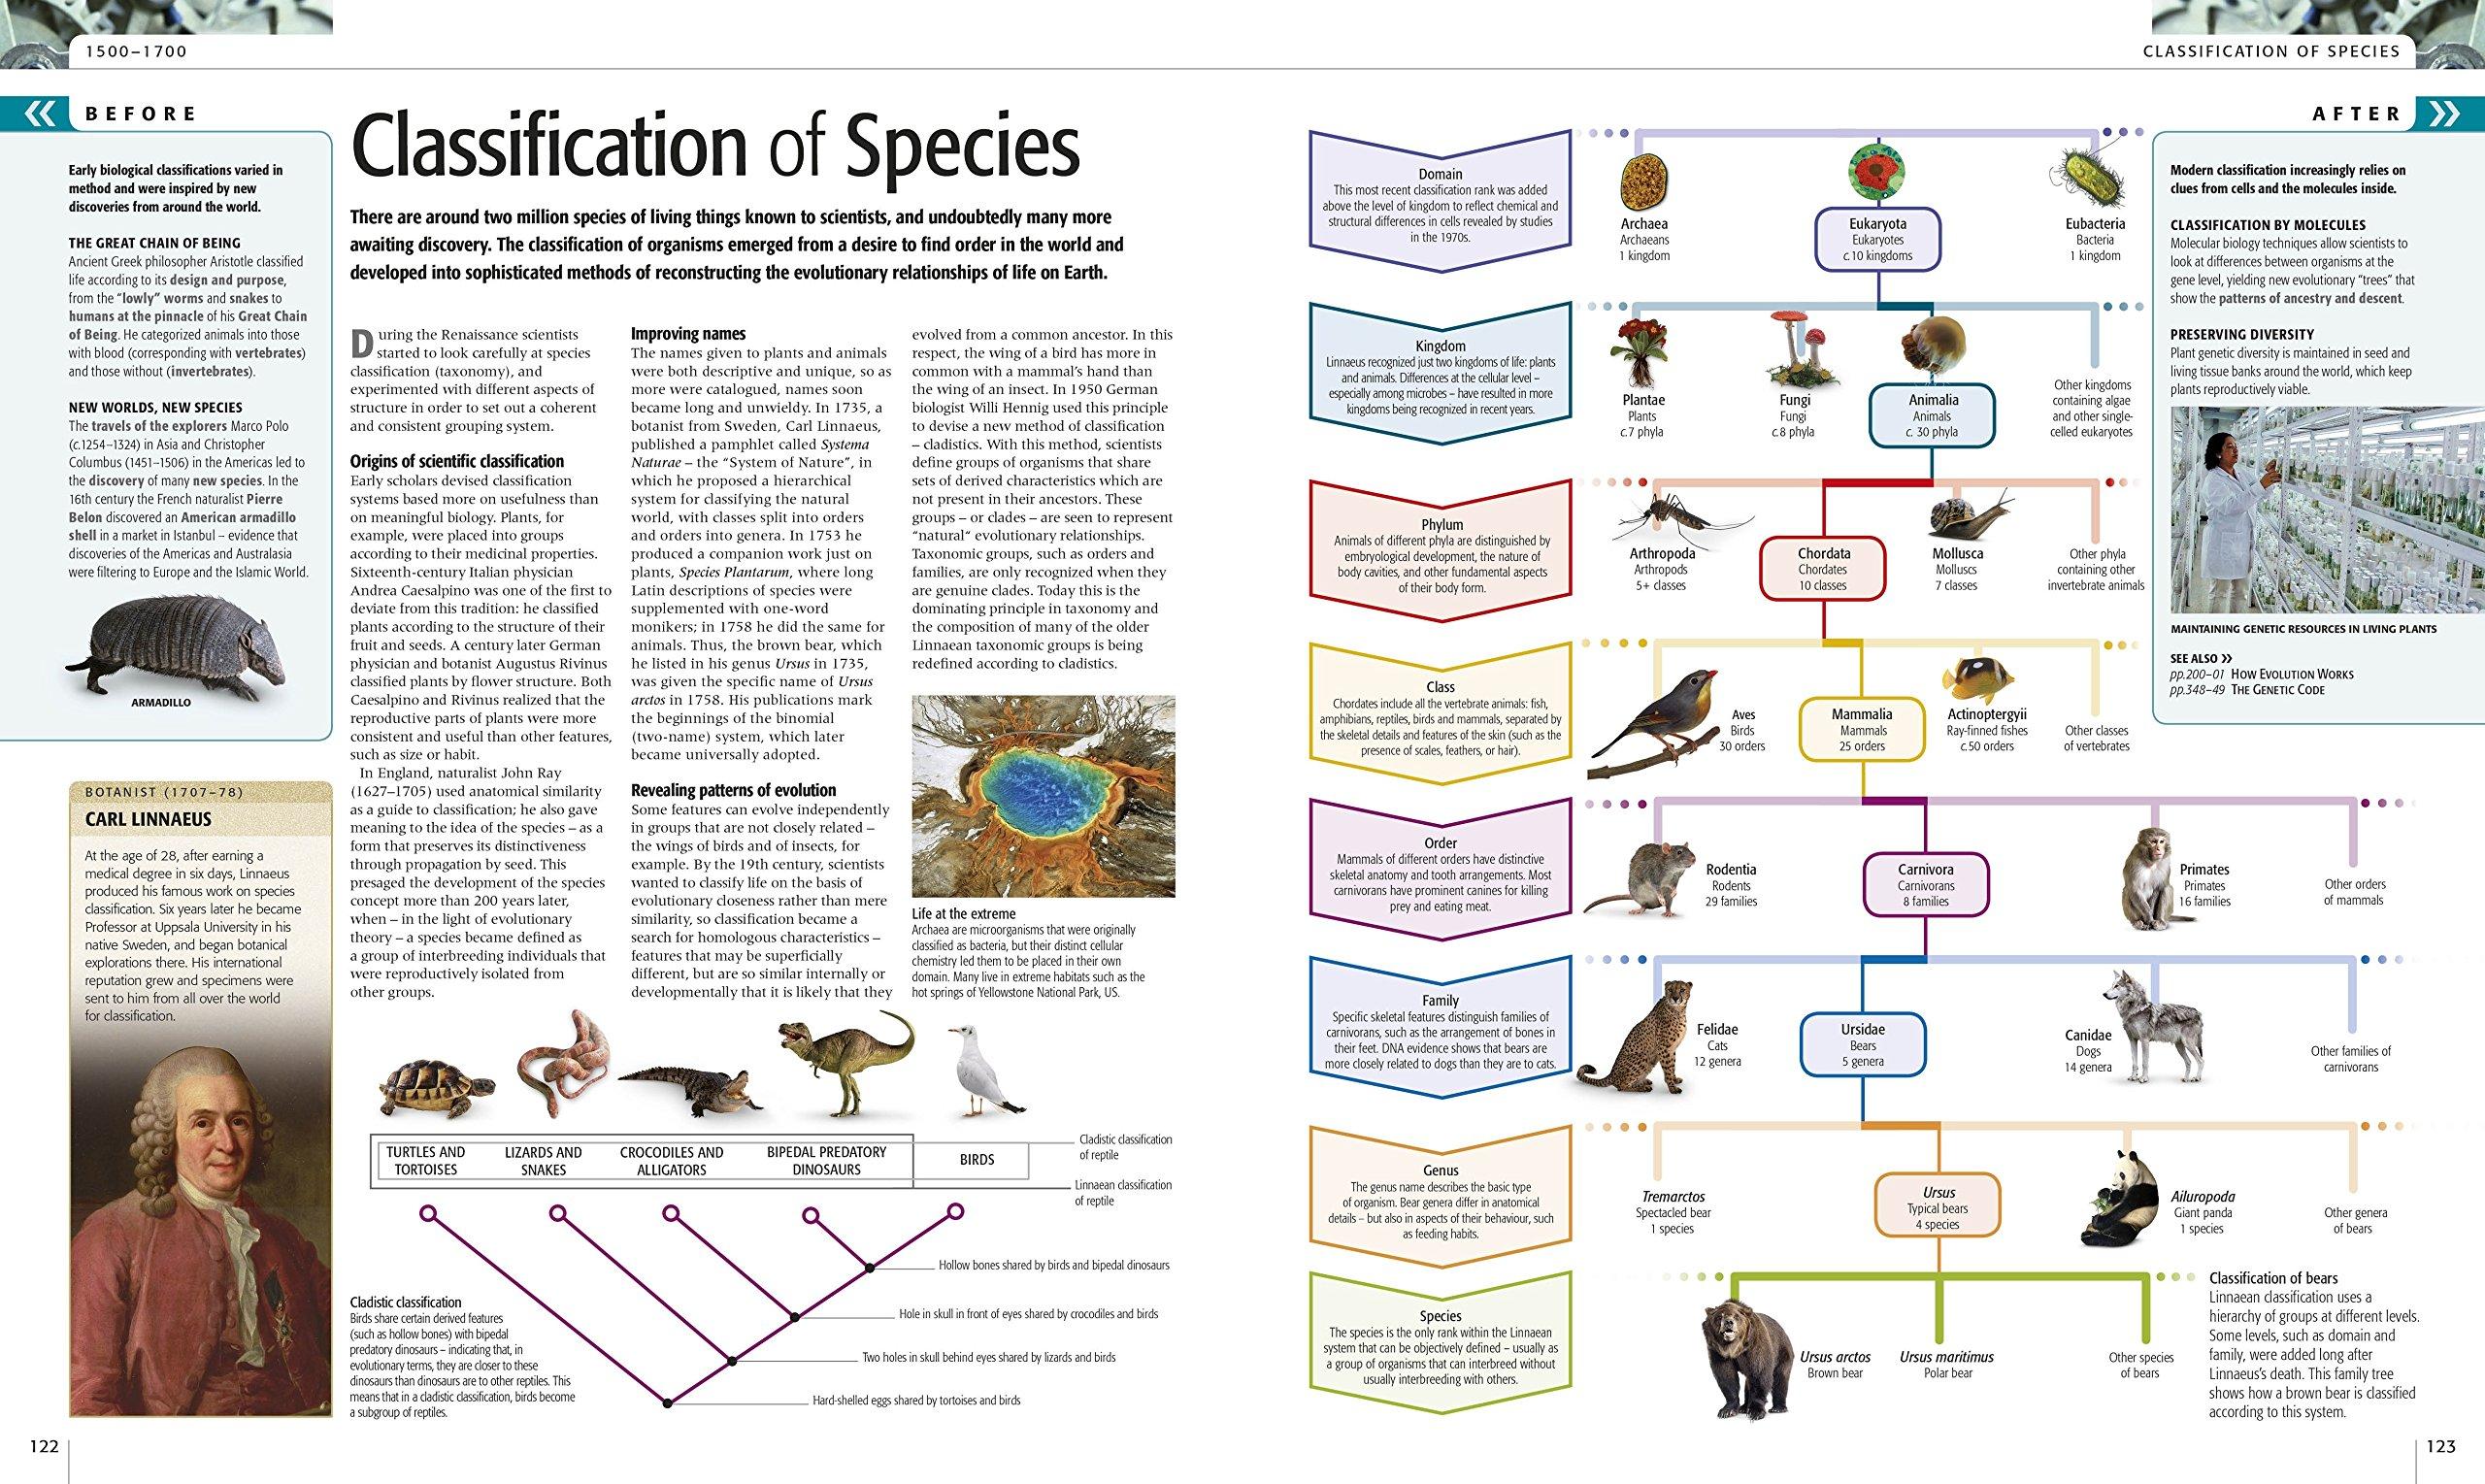 Science The Definitive Visual History Amazoncouk DK Adam Hart Davis 9780241240472 Books